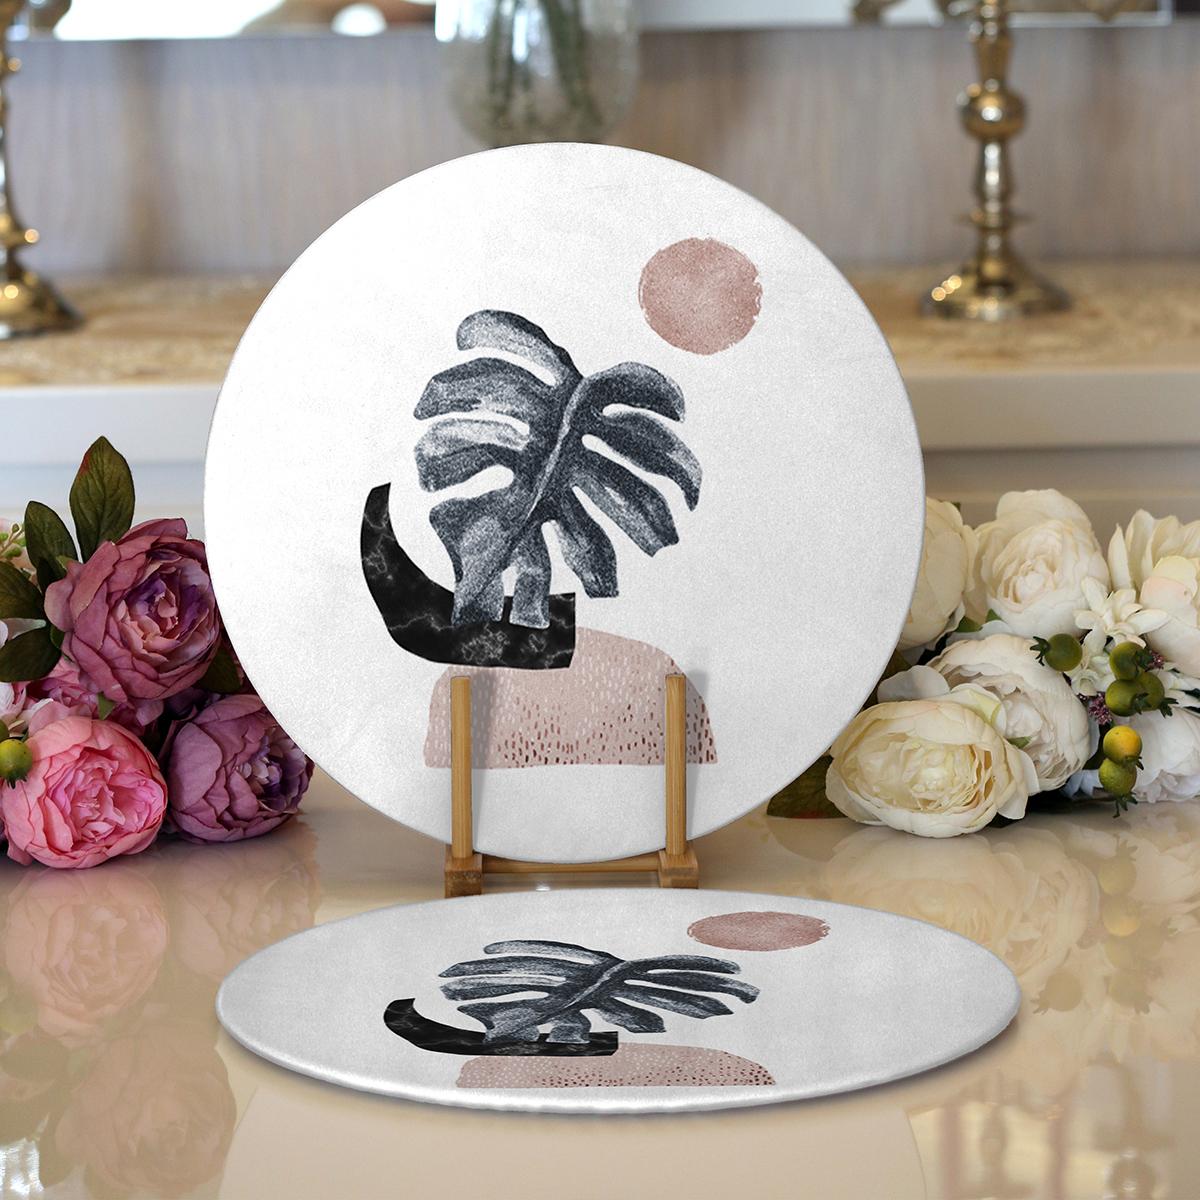 Realhomes Beyaz Zeminde Tropik Yaprak Desen Dijital Baskılı Modern 2'li Yuvarlak Servis Altlığı - Supla Realhomes